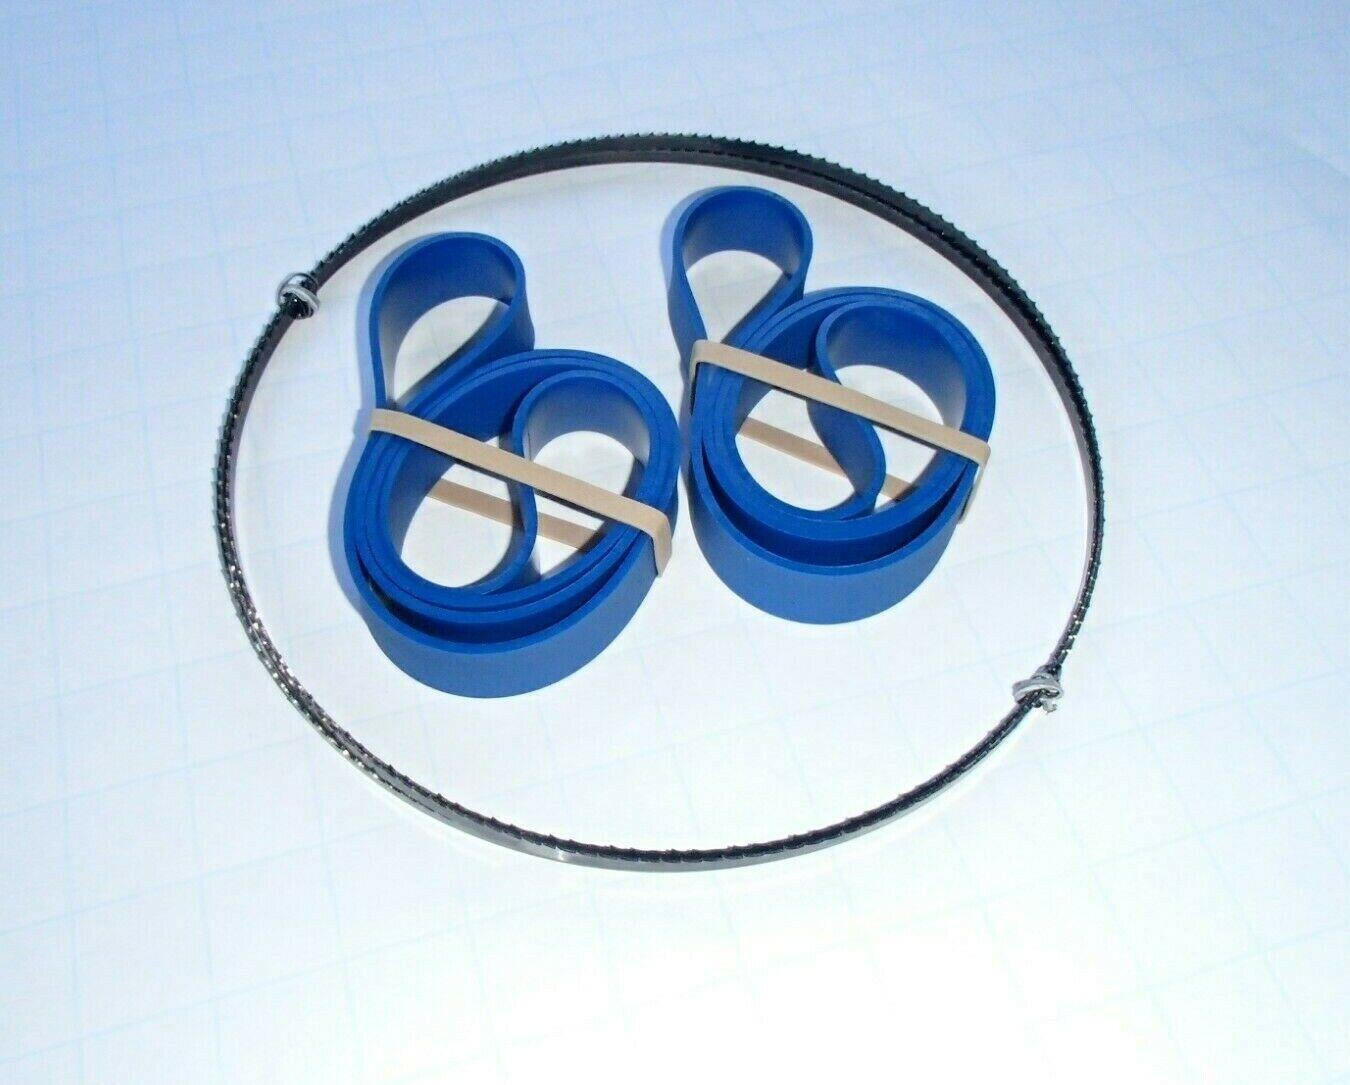 Blau Max Uretano a Nastro Sega Pneumatici + 0.6cm Lama Artigiano 113248212